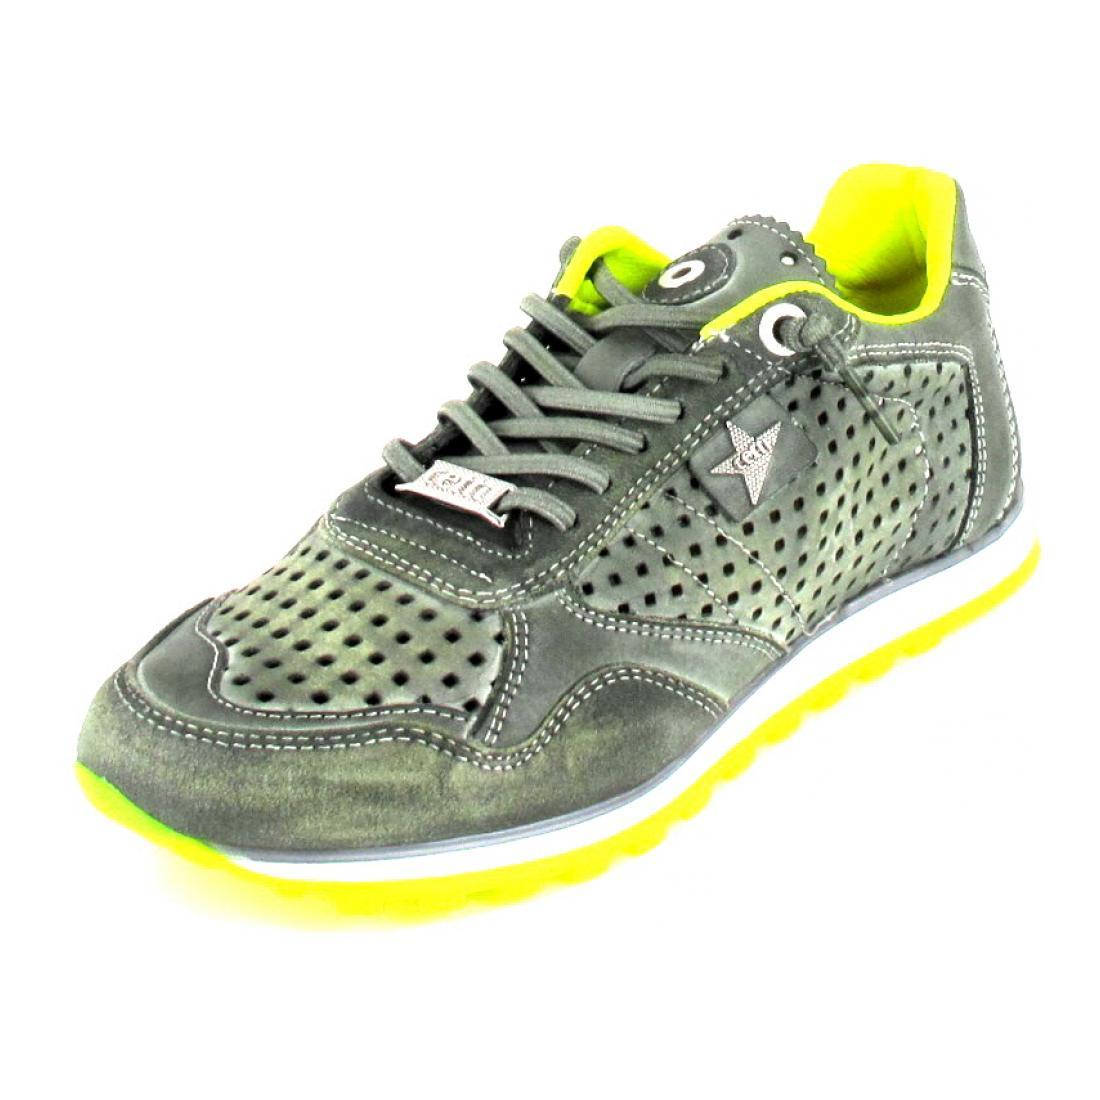 Cetti Sneaker kombat yellow